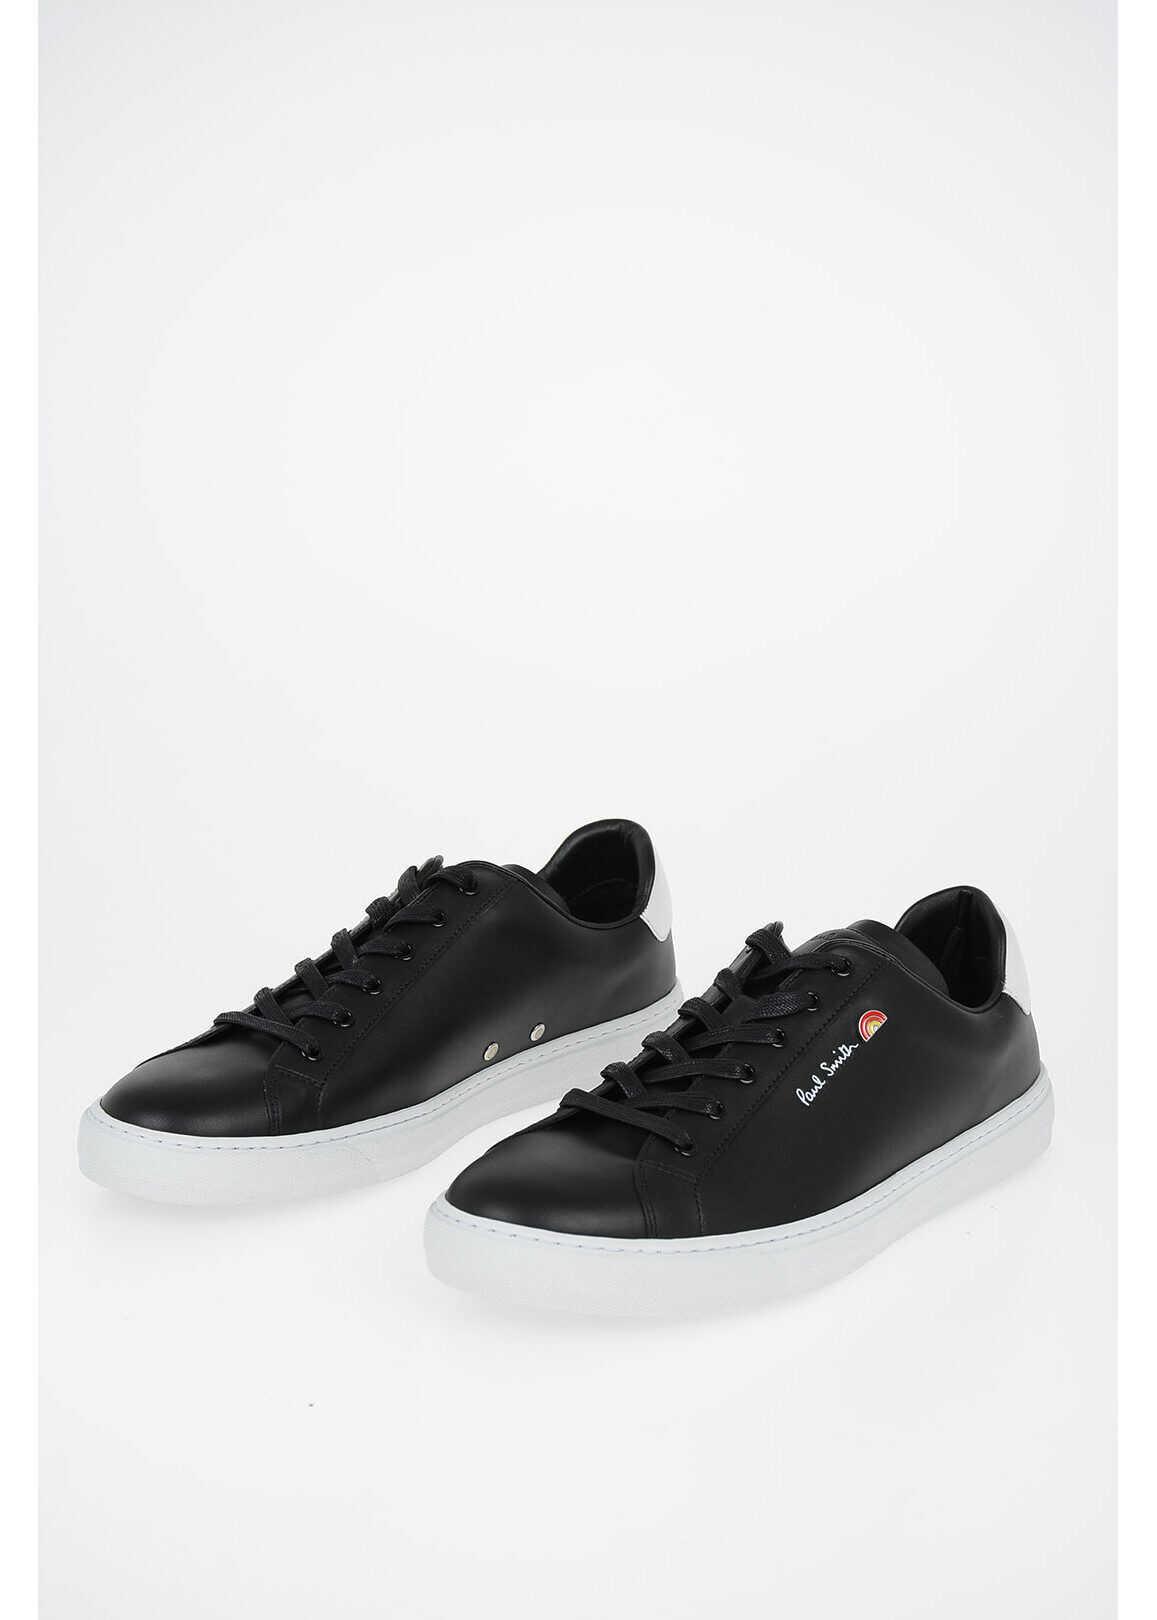 Paul Smith Leather HANSEN Sneakers BLACK